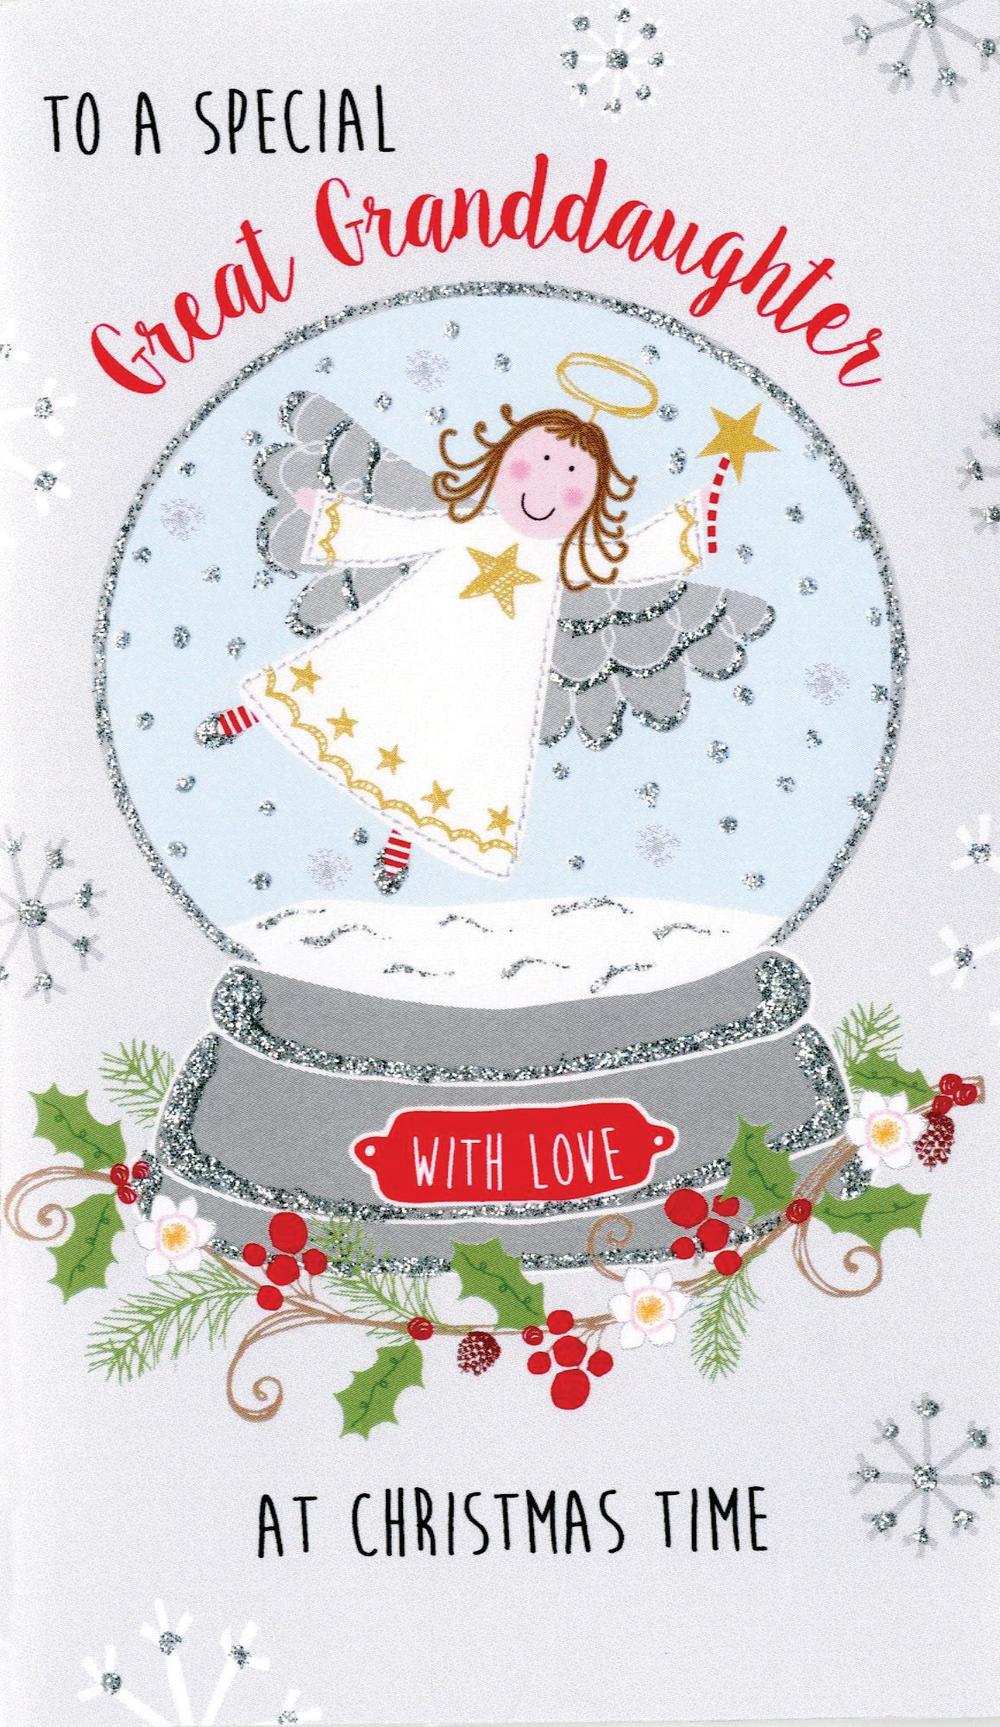 Great-Granddaughter Moneyholder Christmas Gift Card